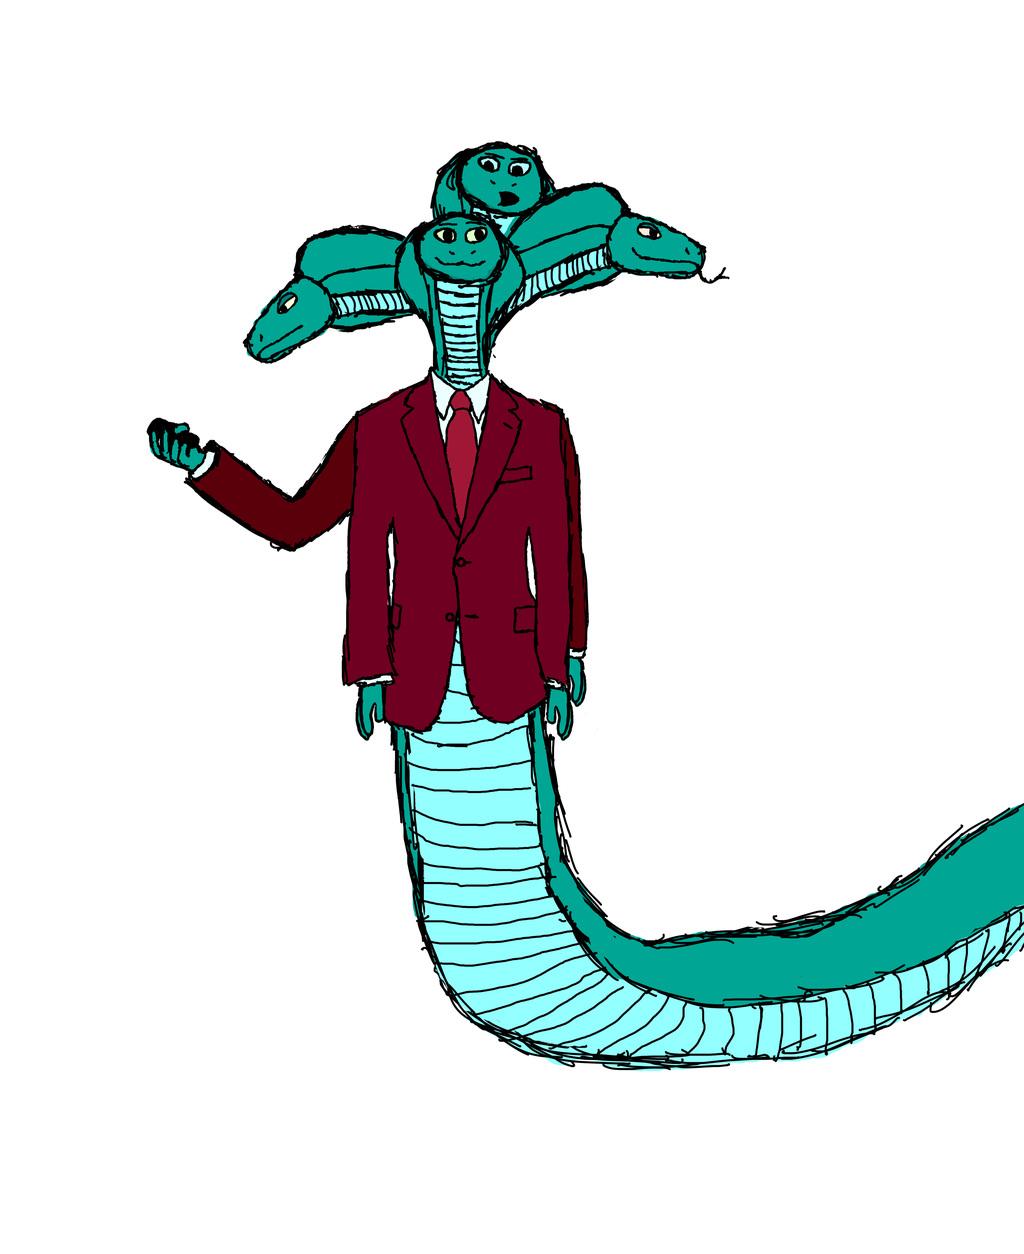 Most recent image: Johnny Enigma (alternate color scheme)